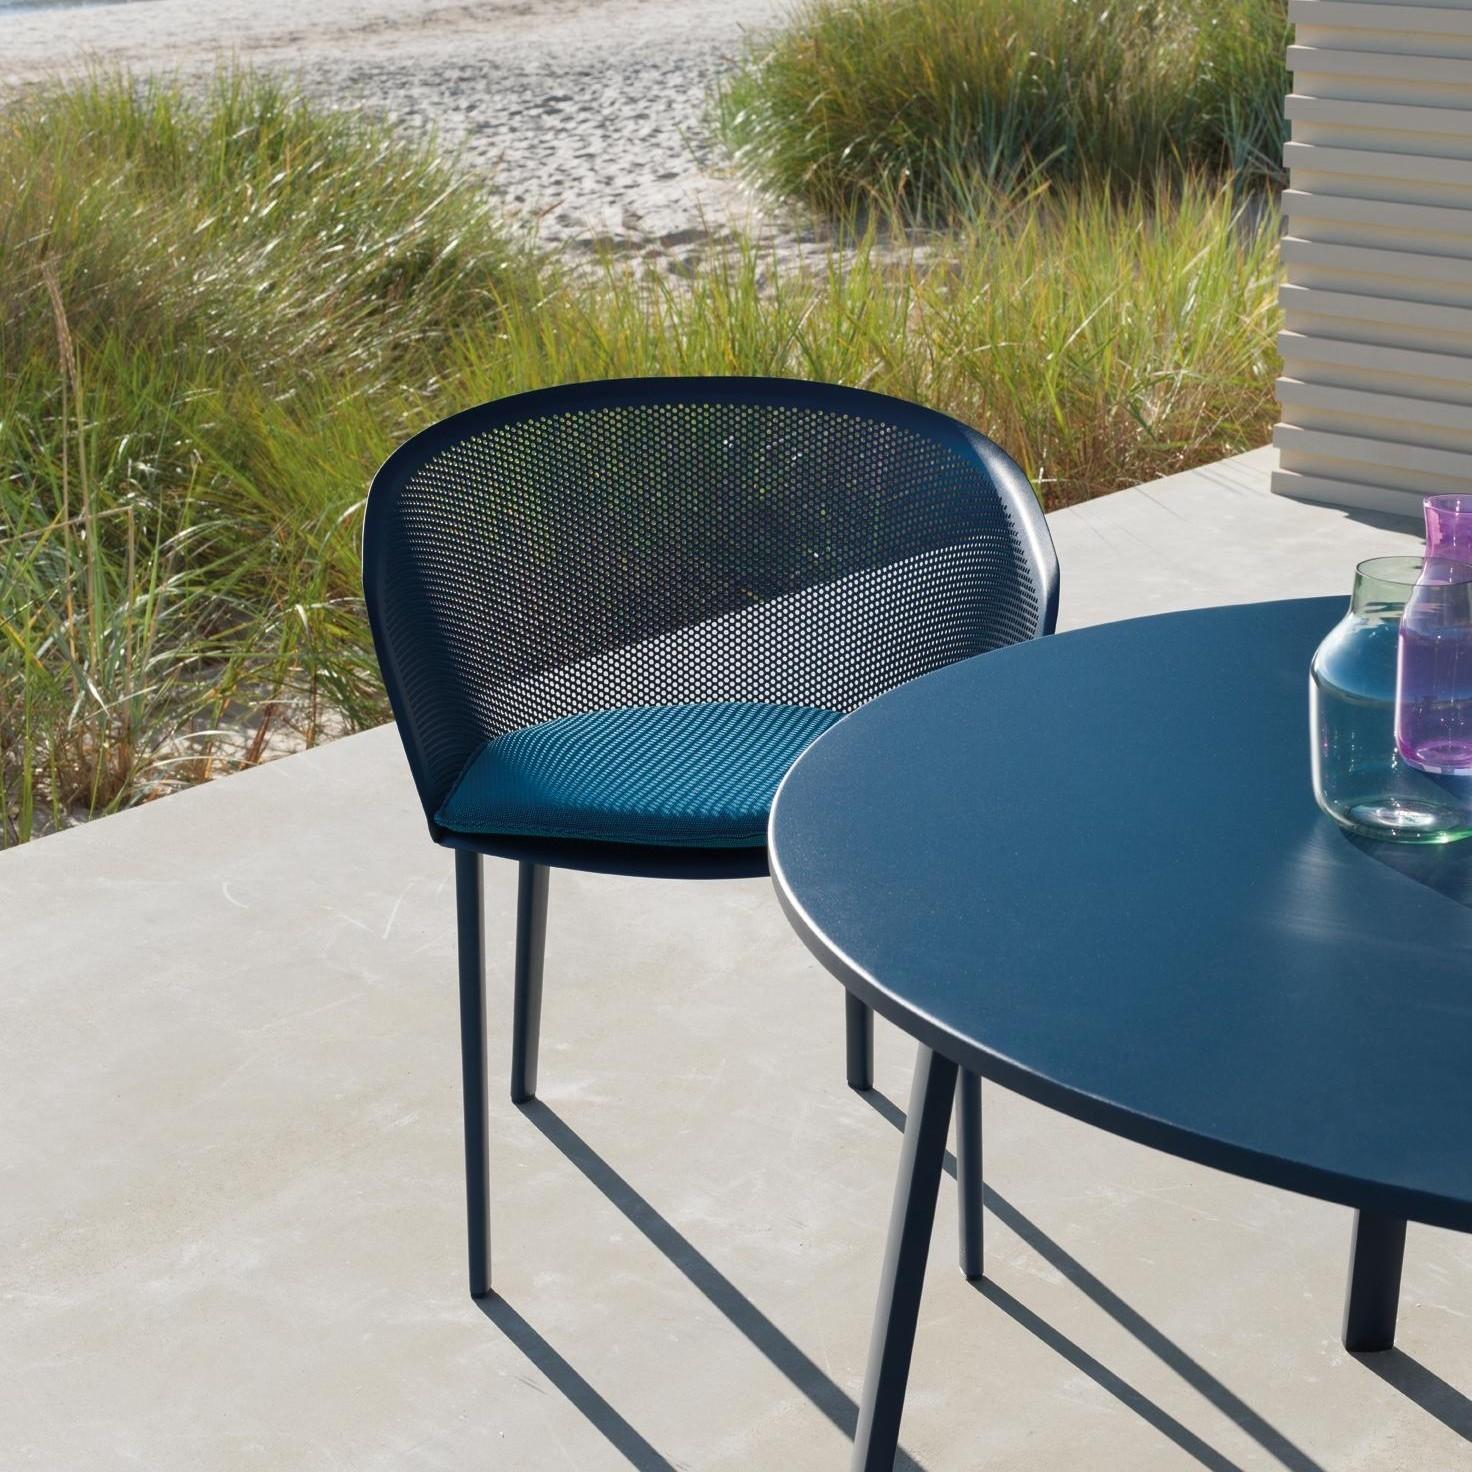 Kettal Stampa - Chaise de jardin avec accoudoirs | AmbienteDirect